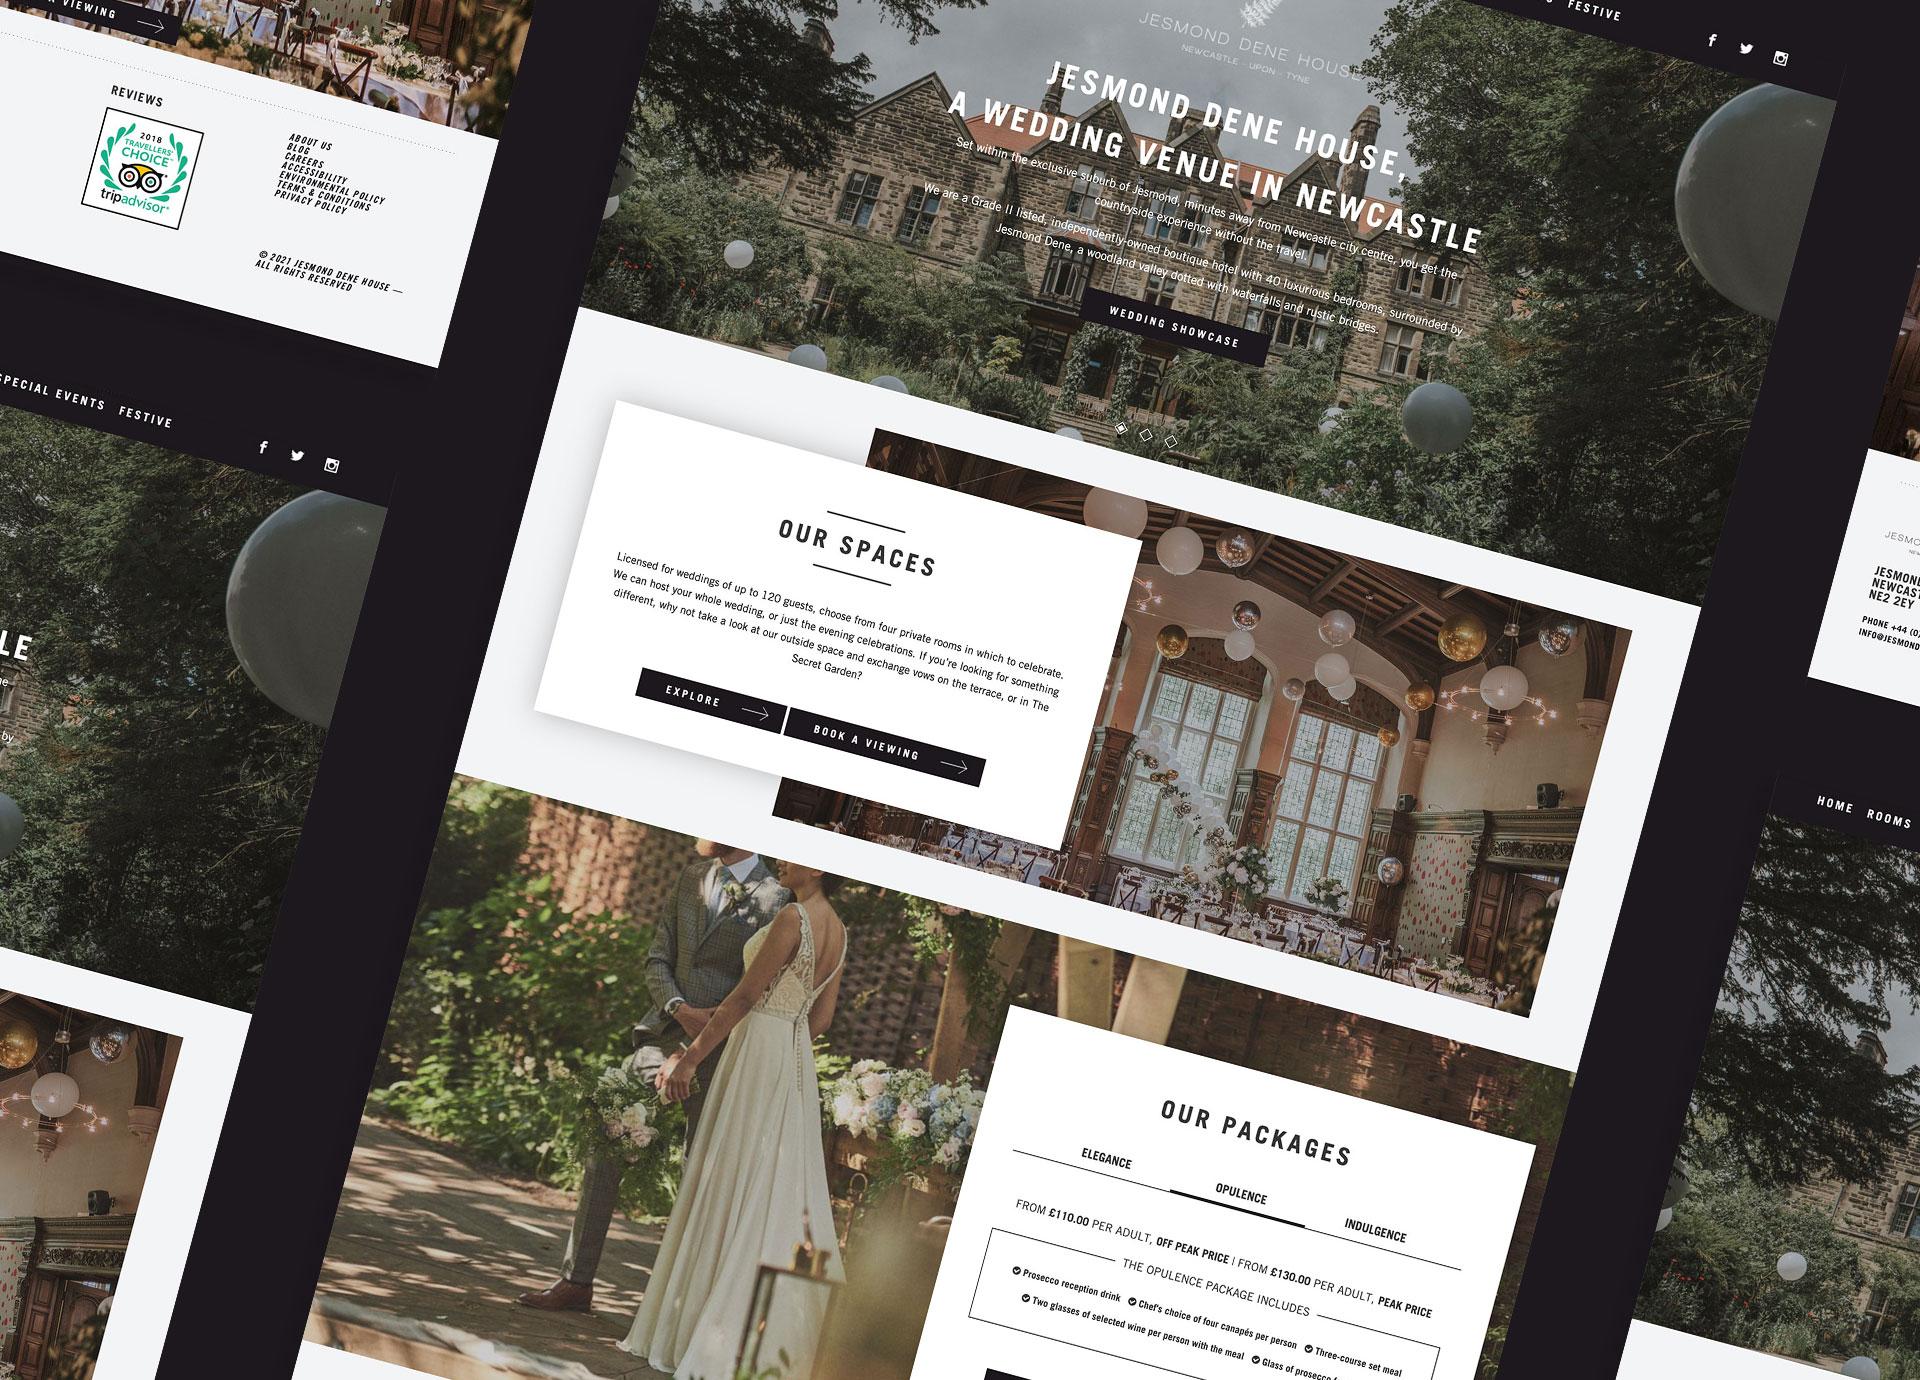 Jesmond Dene House website design